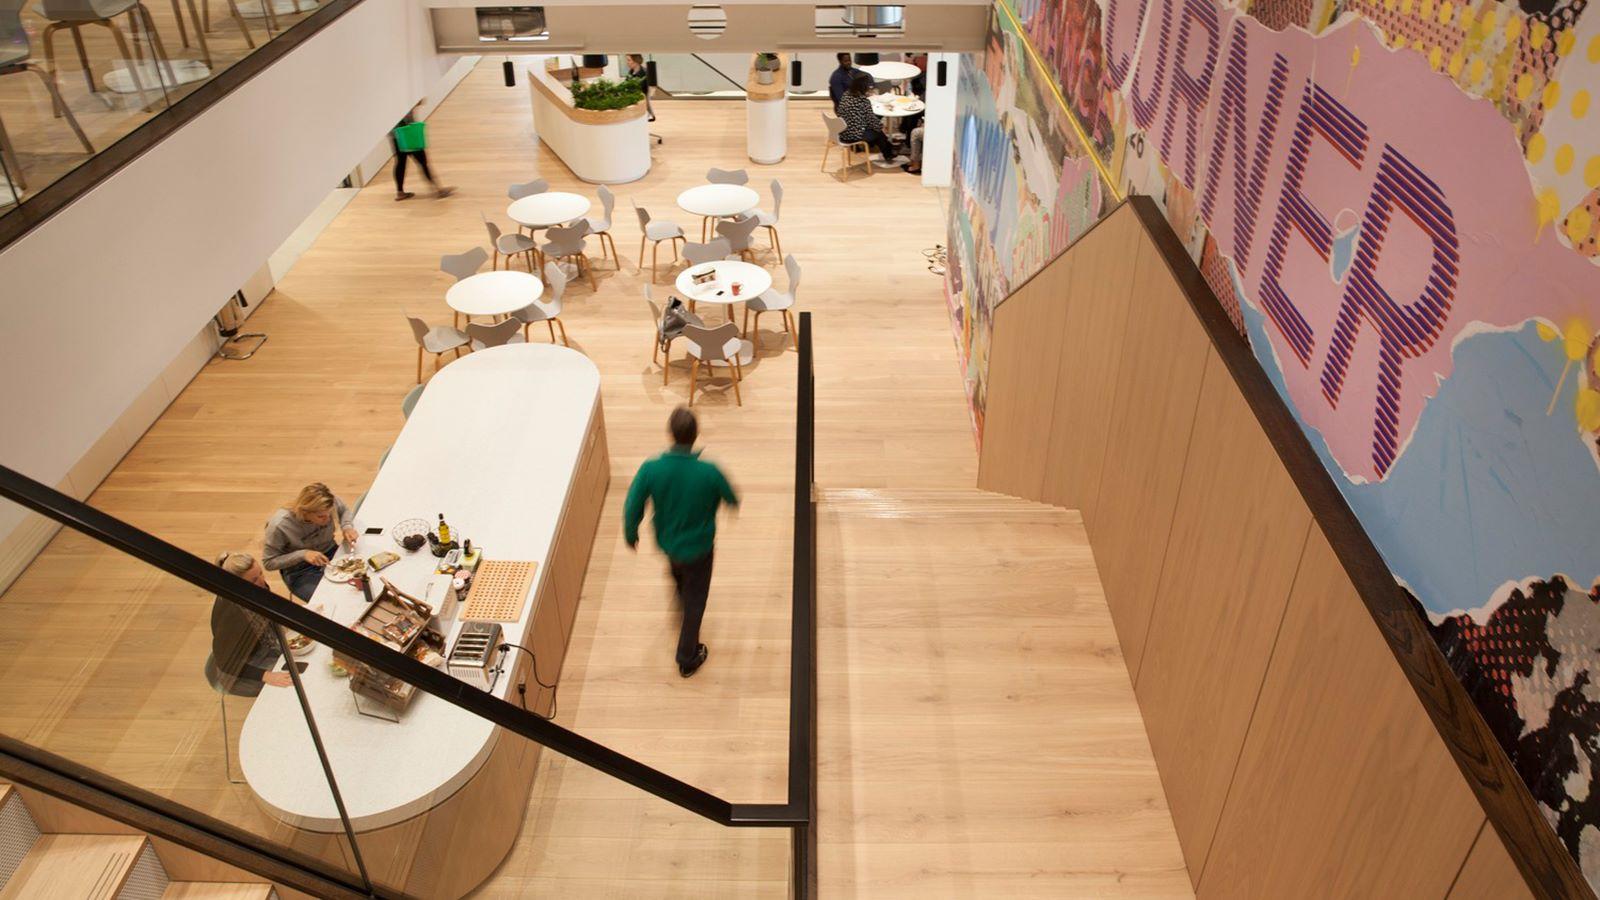 Interior of Money Supermarket Building - Mace Group